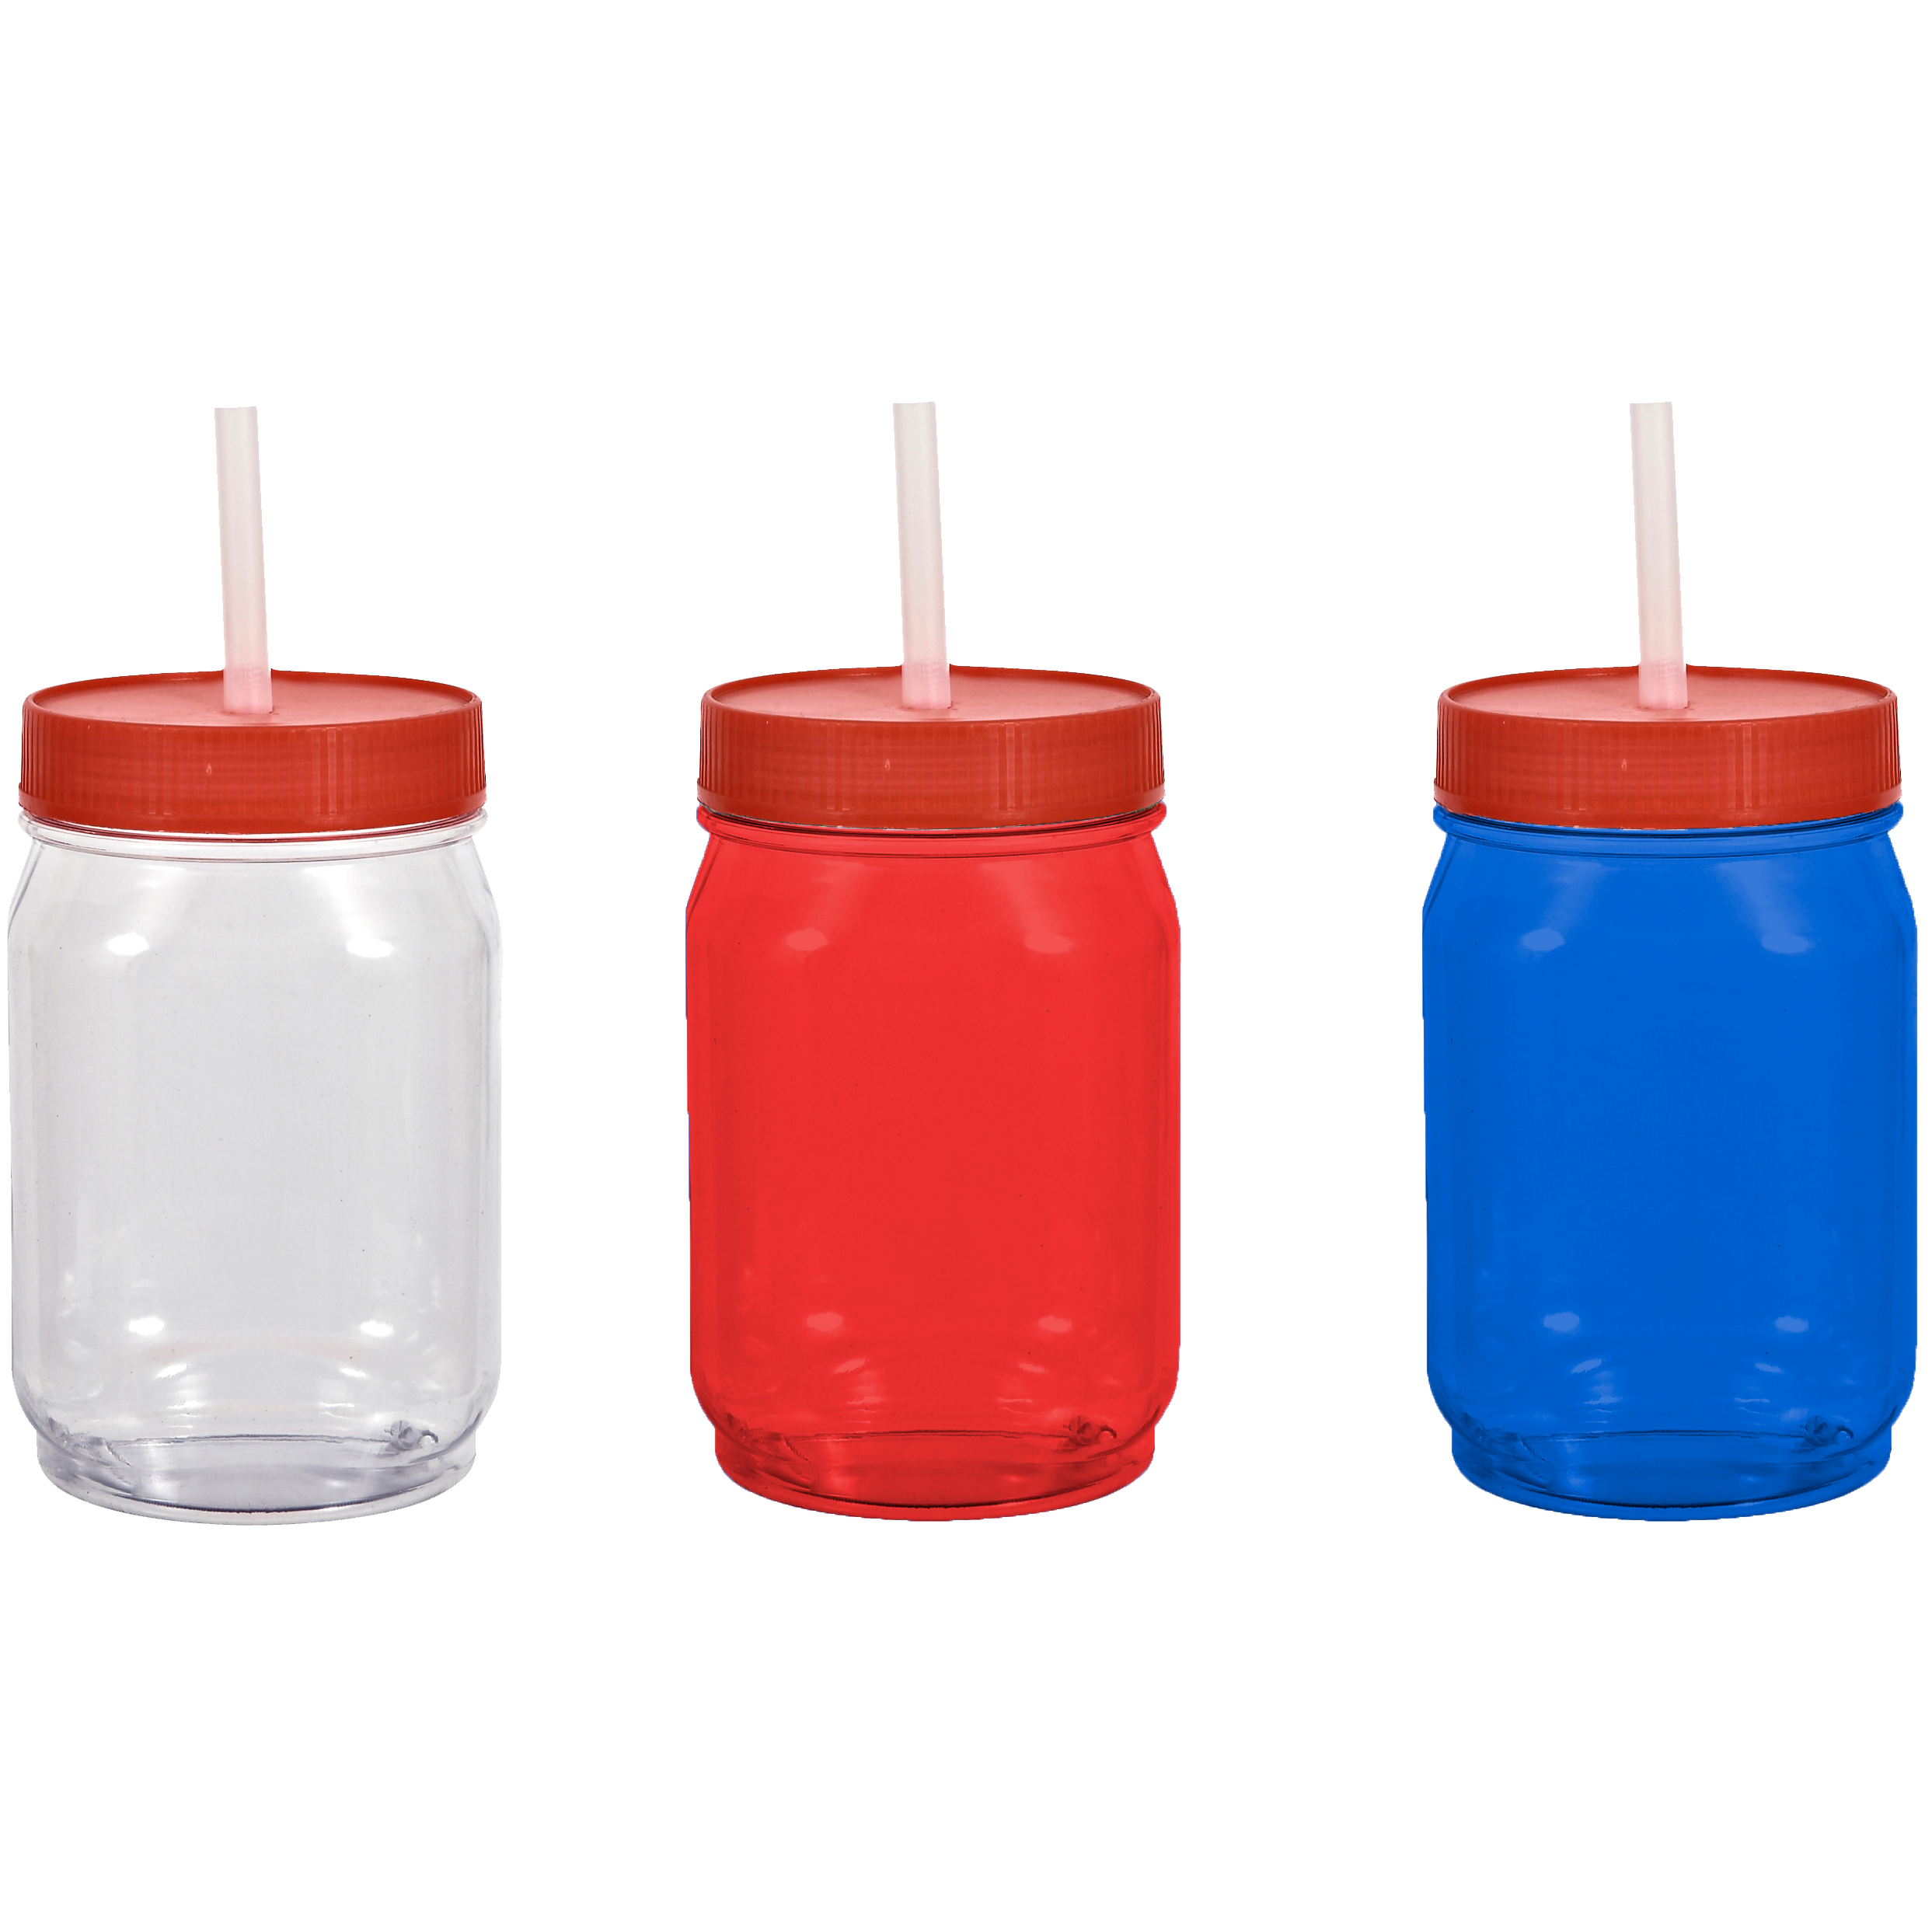 Sbd promo yard alien. Cup clipart colored plastic